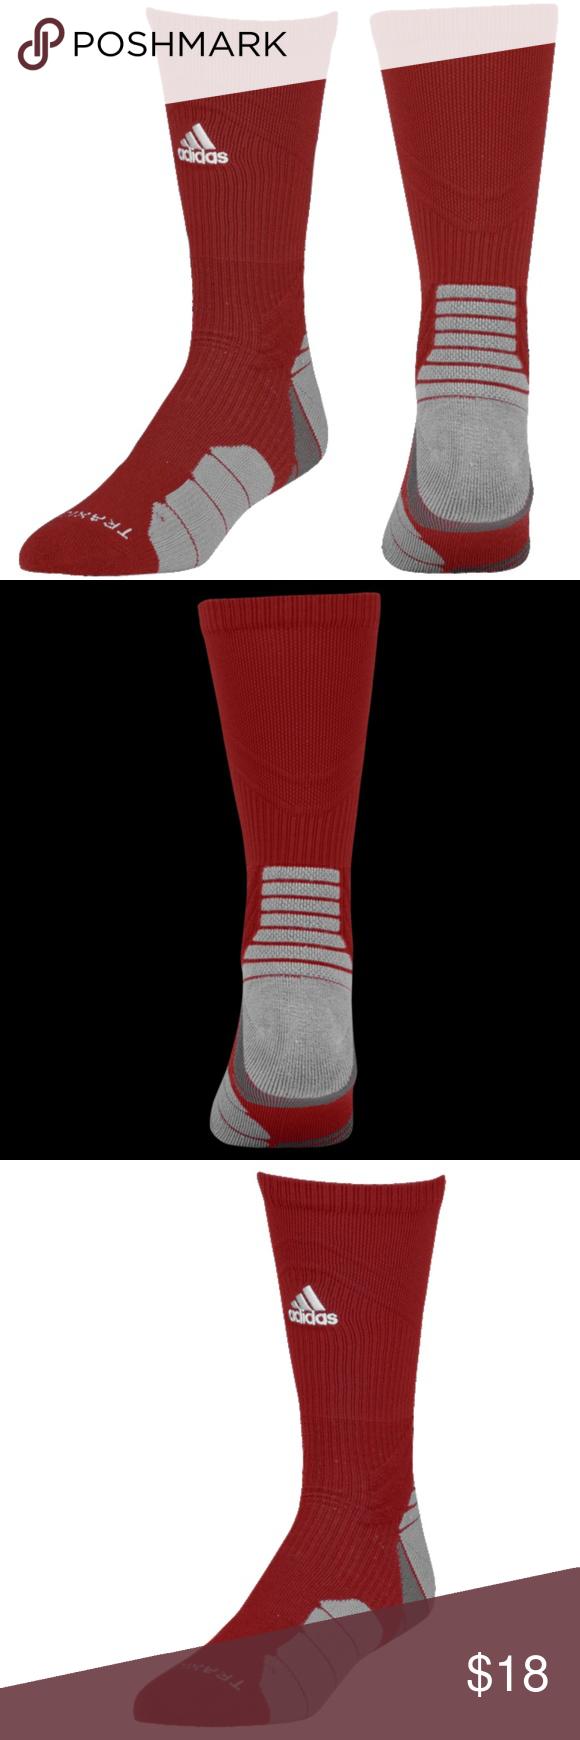 adidas Traxion Menace FootballBasketball Crew Socks